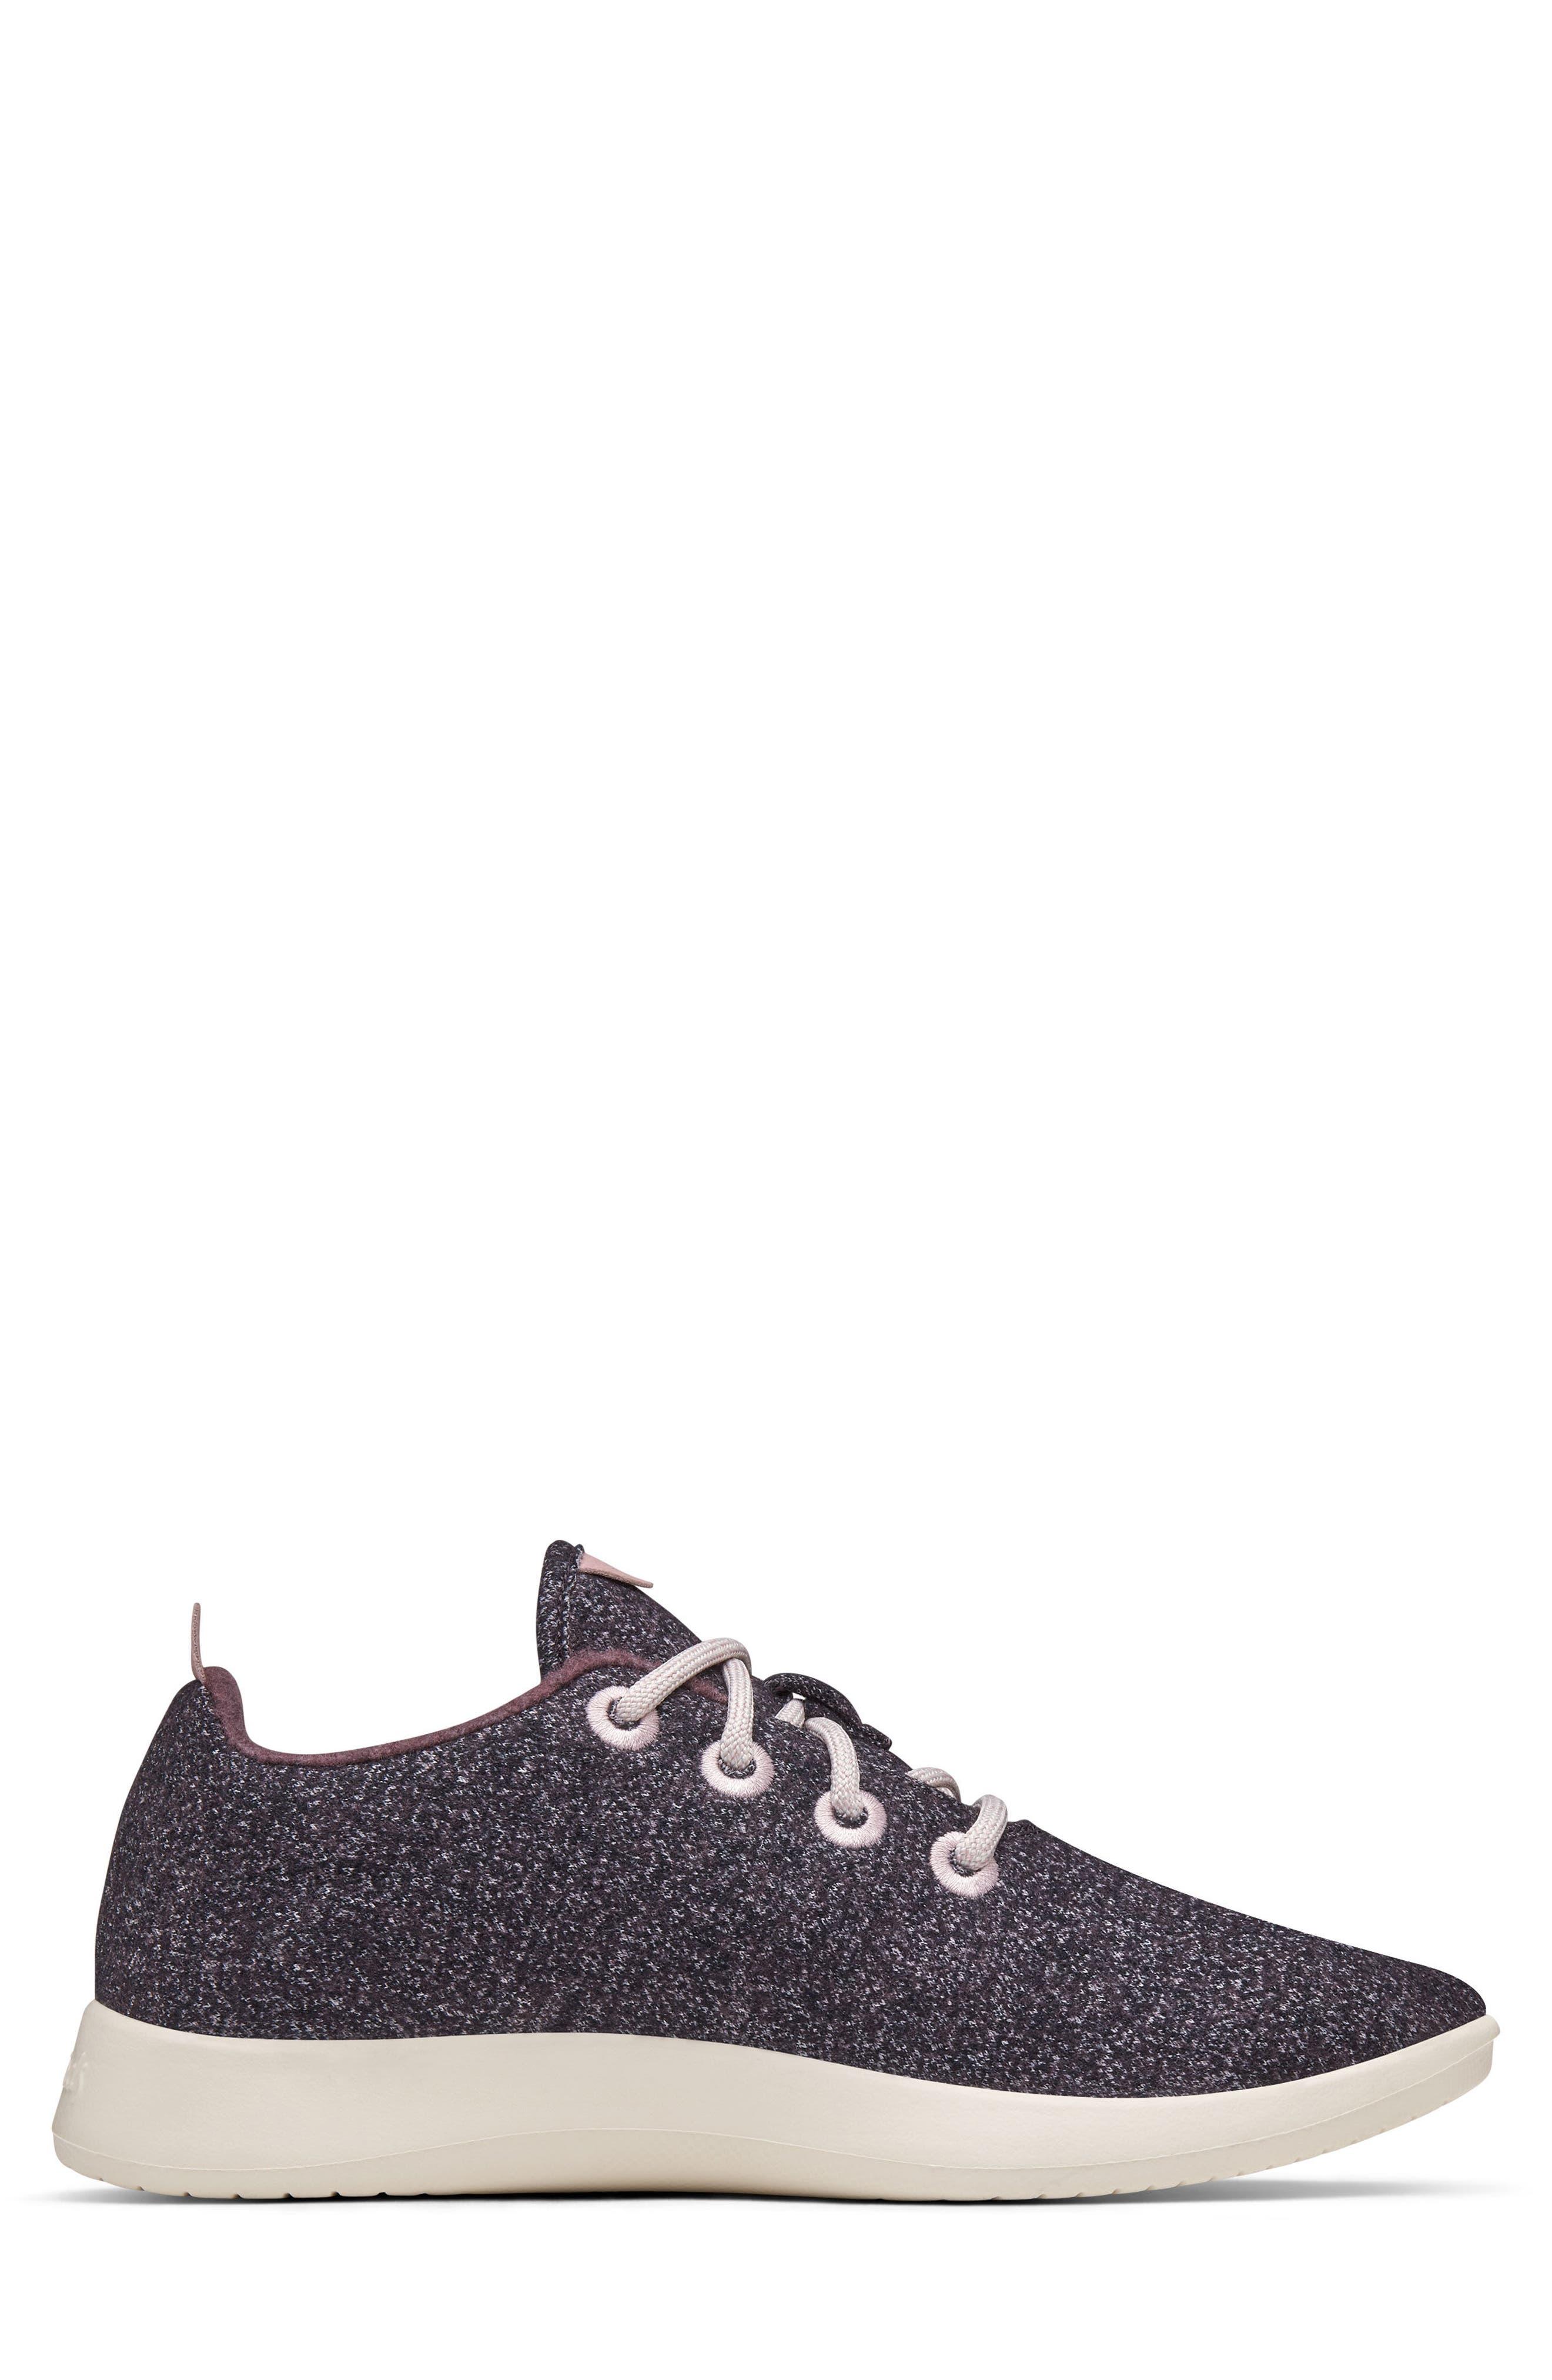 Wool Runner,                             Alternate thumbnail 3, color,                             HAWTHORNE PURPLE WOOL